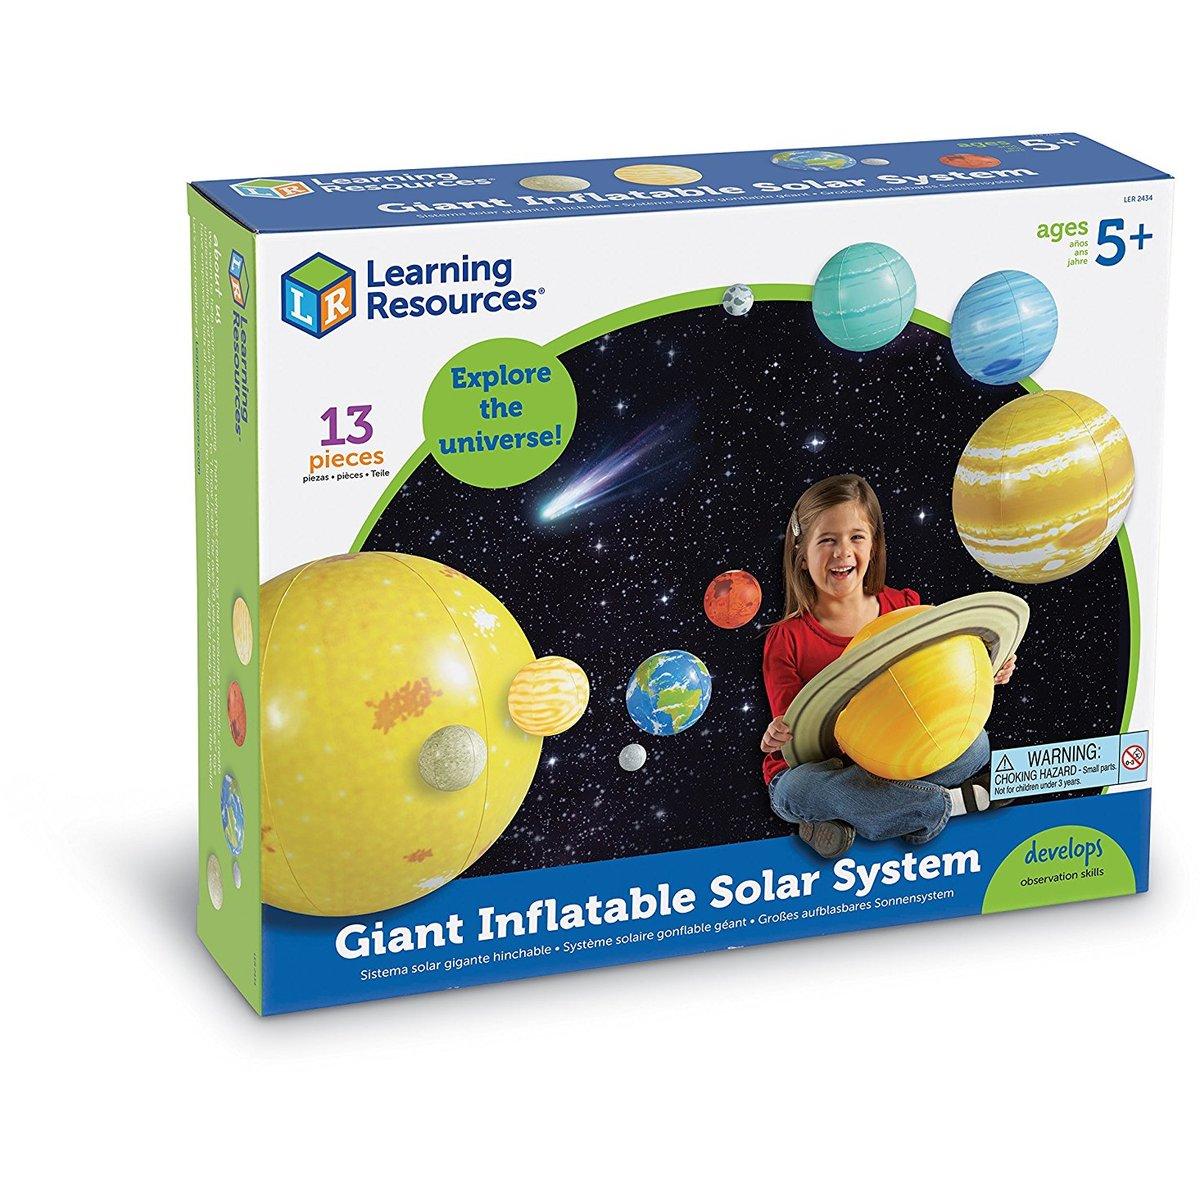 Sistemul Solar Gonflabil imagine